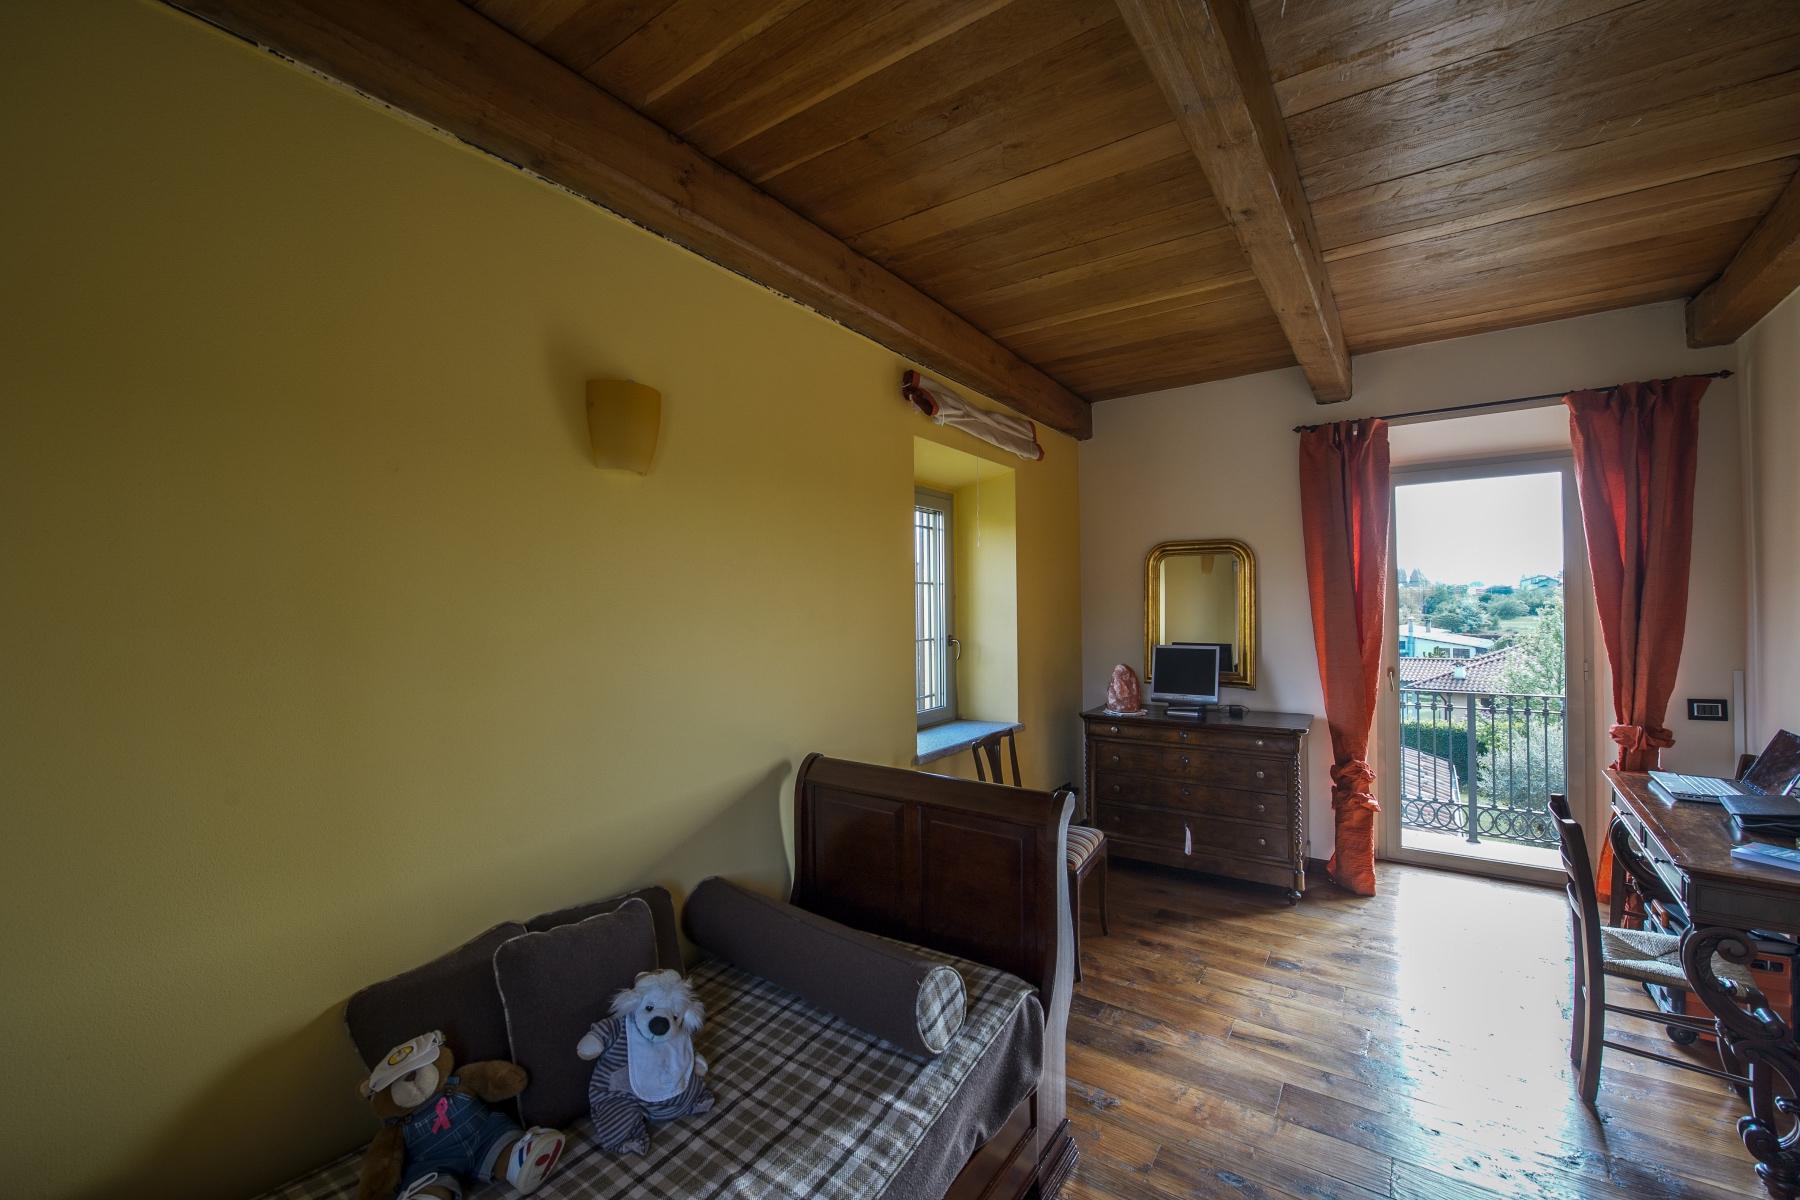 Casa indipendente in Vendita a Agrate Conturbia: 5 locali, 400 mq - Foto 14